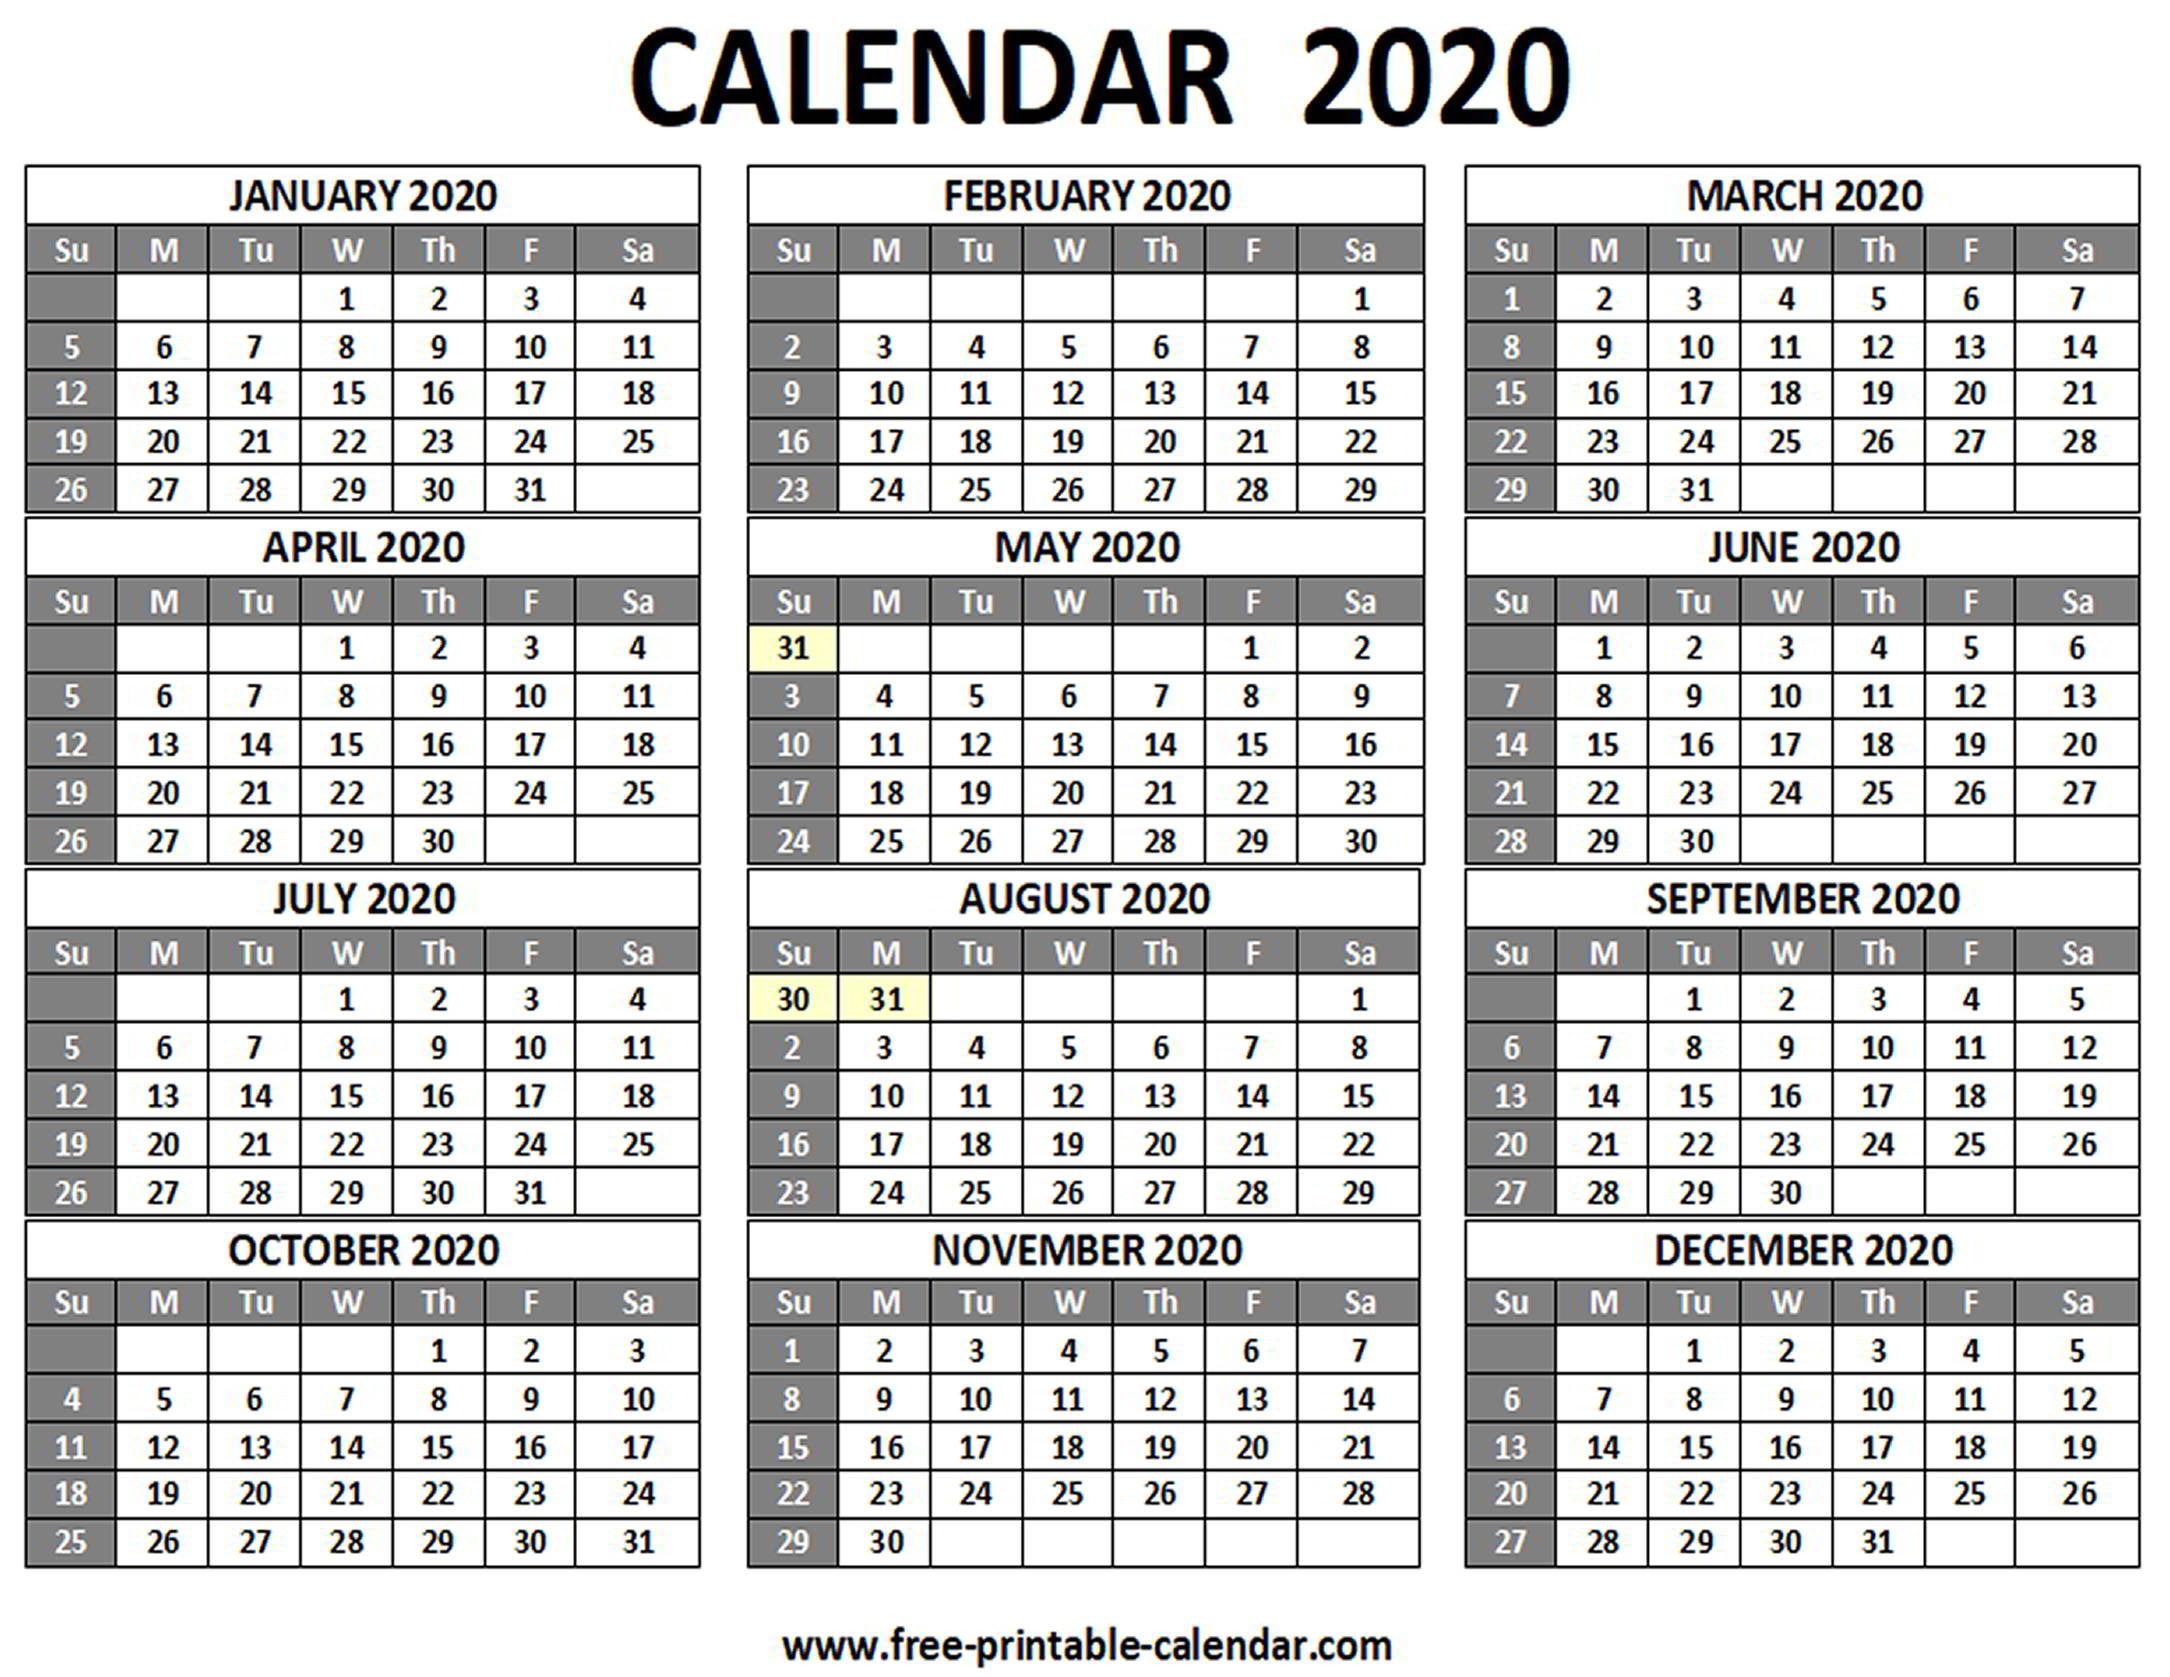 Printable 2020 Calendar  Freeprintablecalendar within Printable 12 Month 2020 Calendar